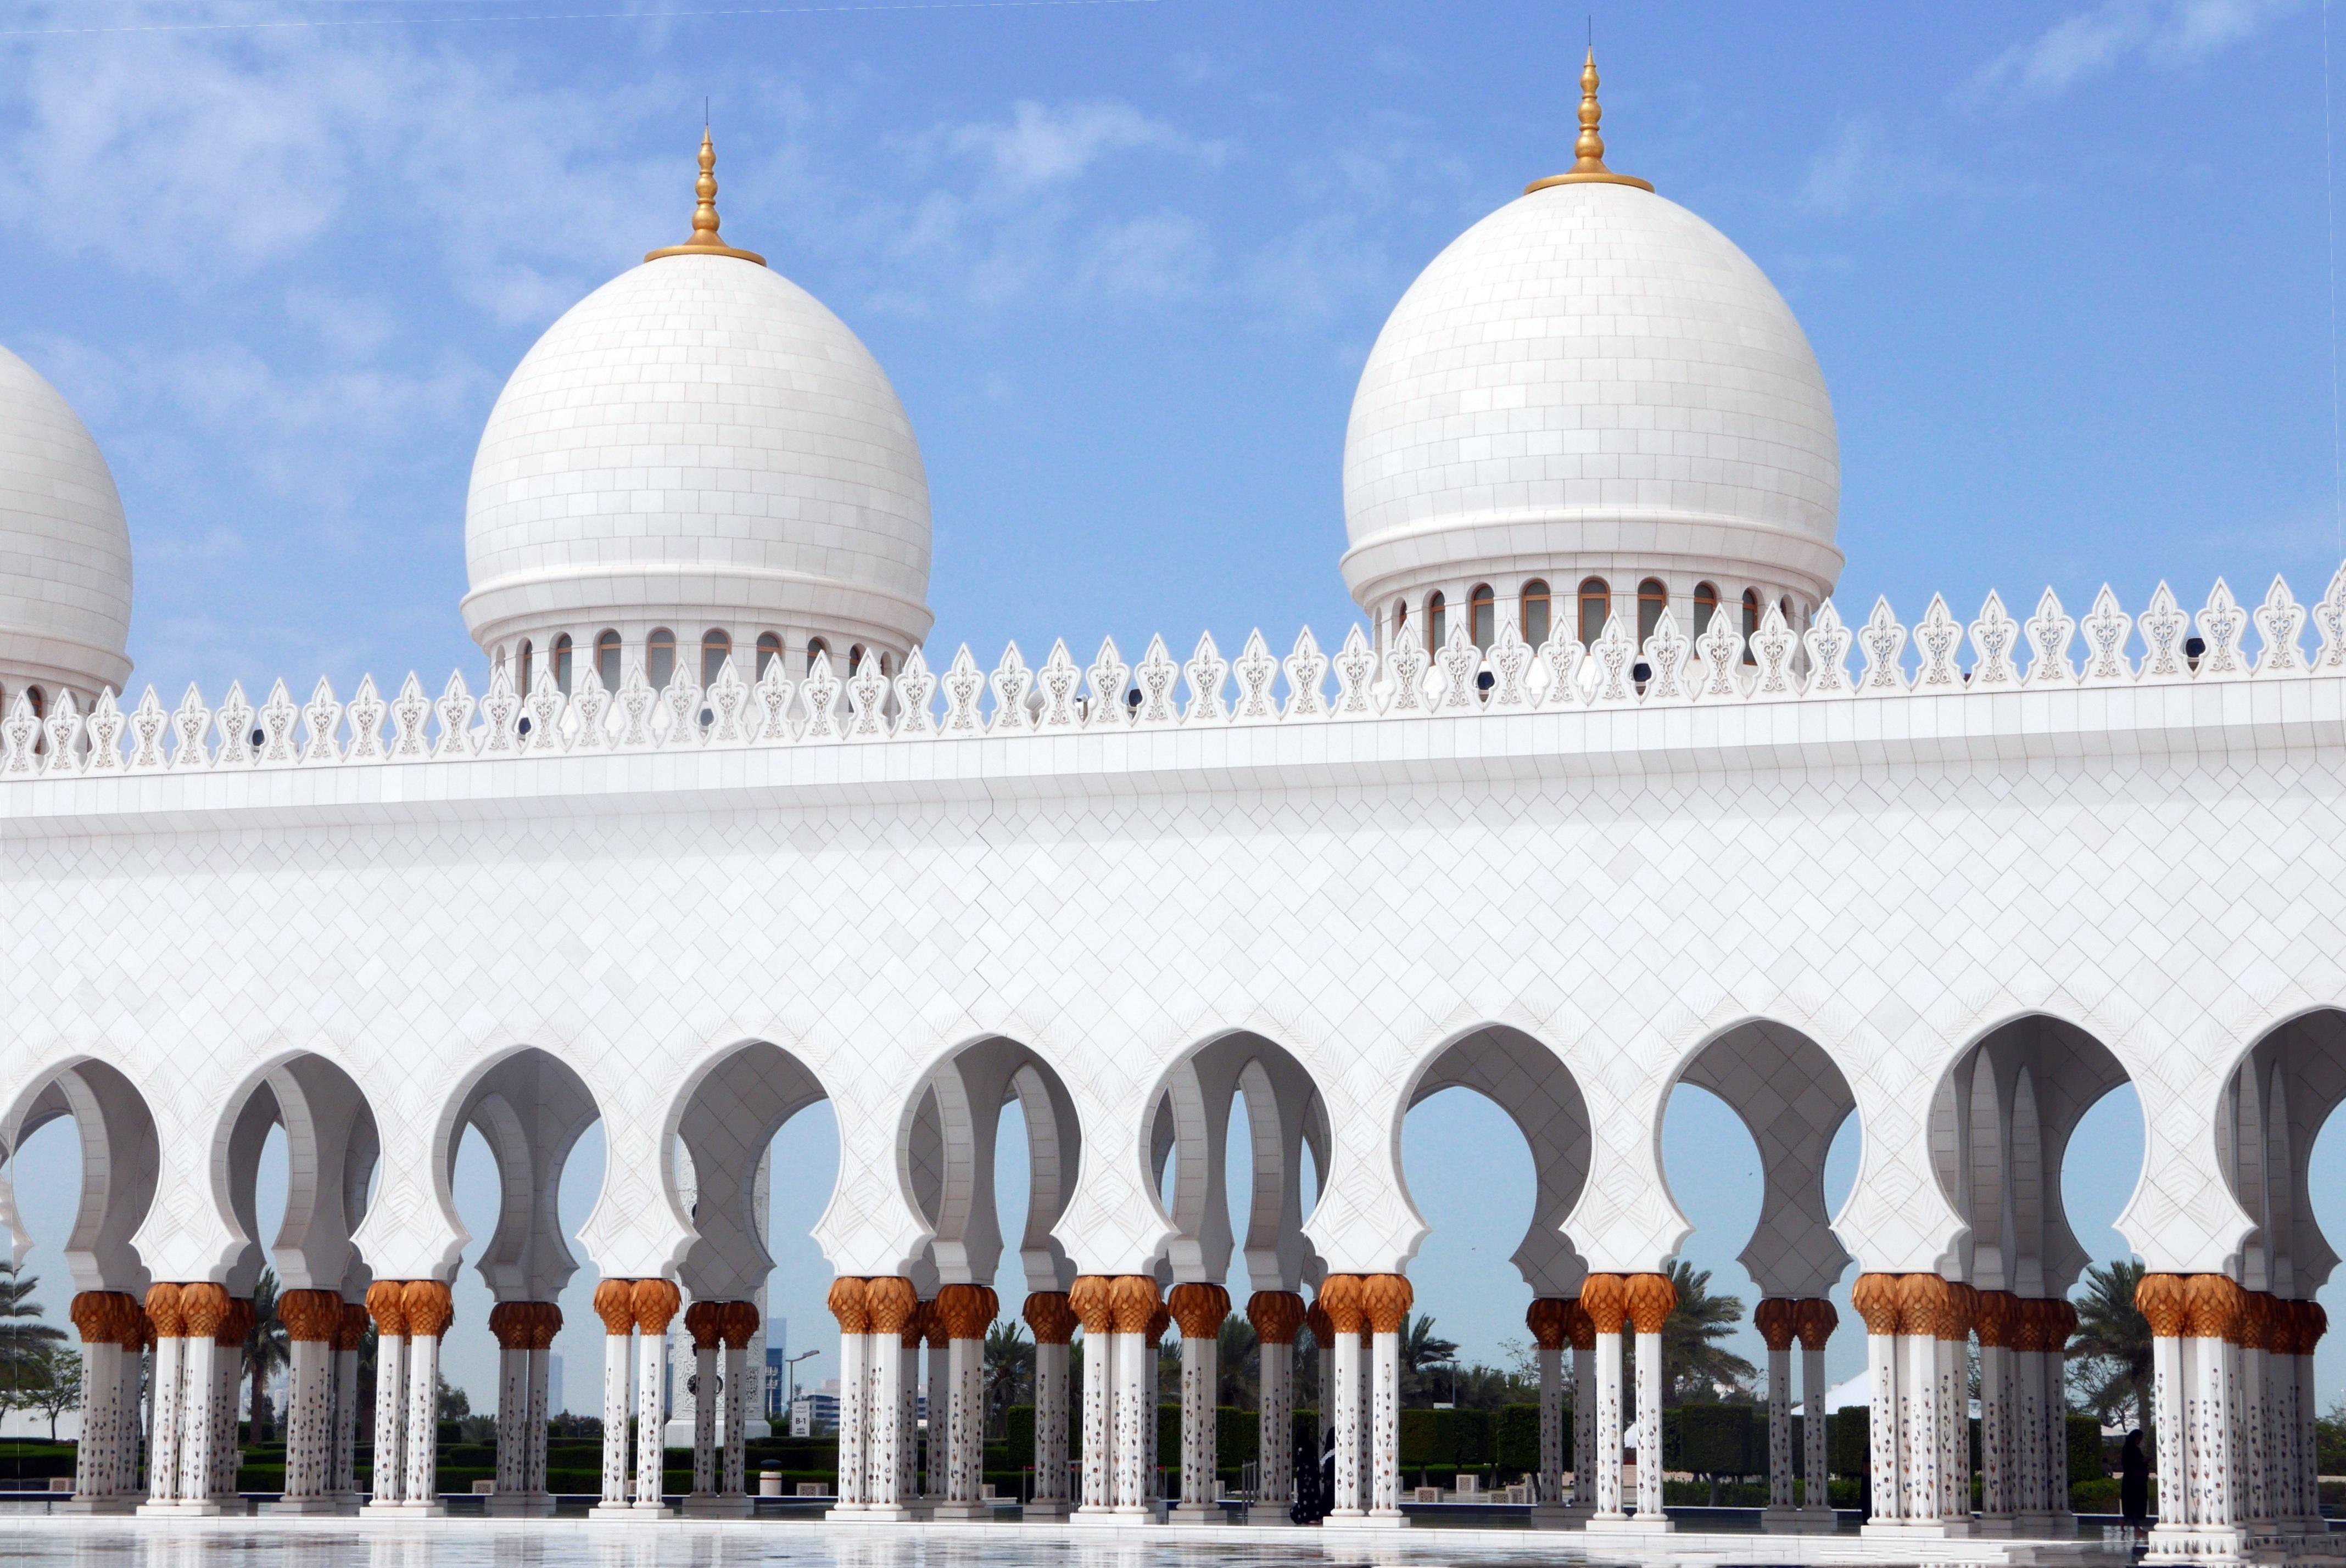 edificio lugar de adoracin mezquita columnata abu dhabi jeque zayed mezquita